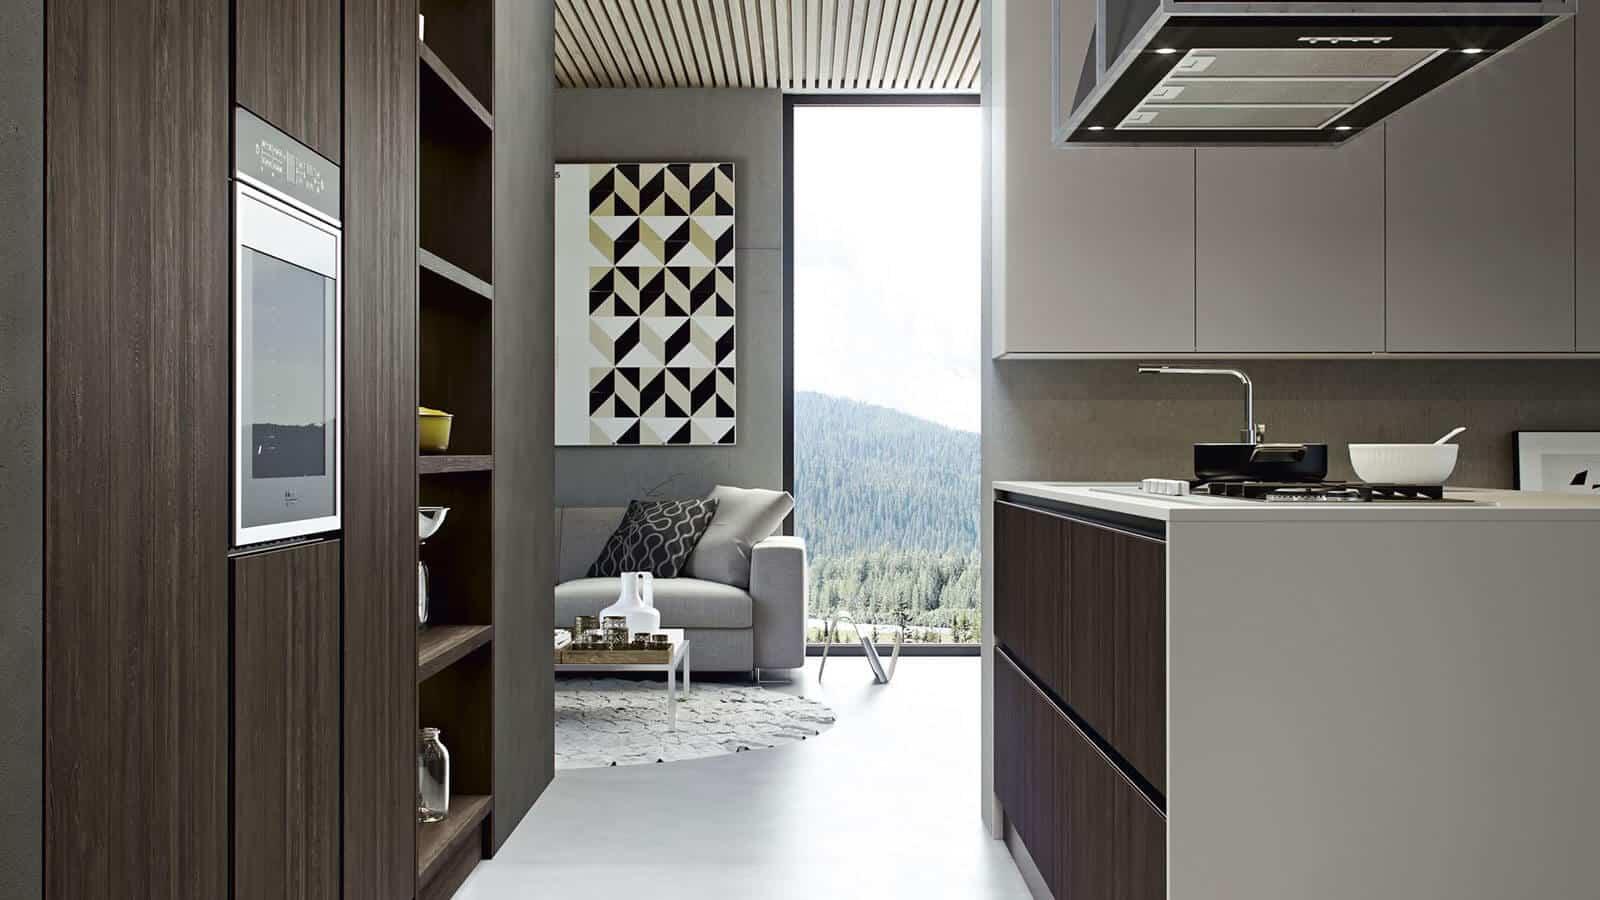 Cuisine En Bois Fabrication Et Design Italiens Optimal Annecy